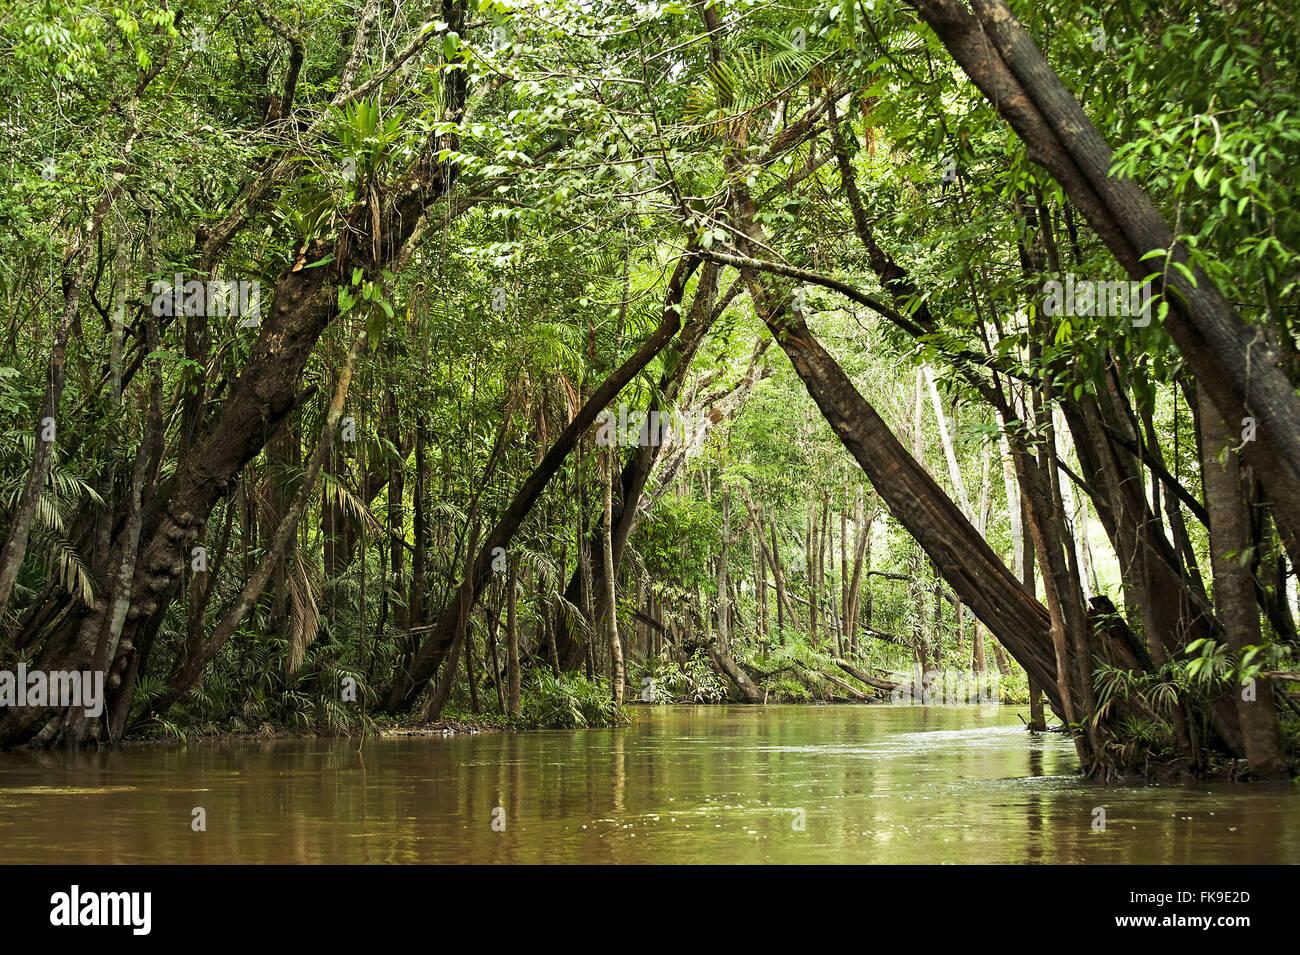 Igarape in the Amazon region - Stock Image